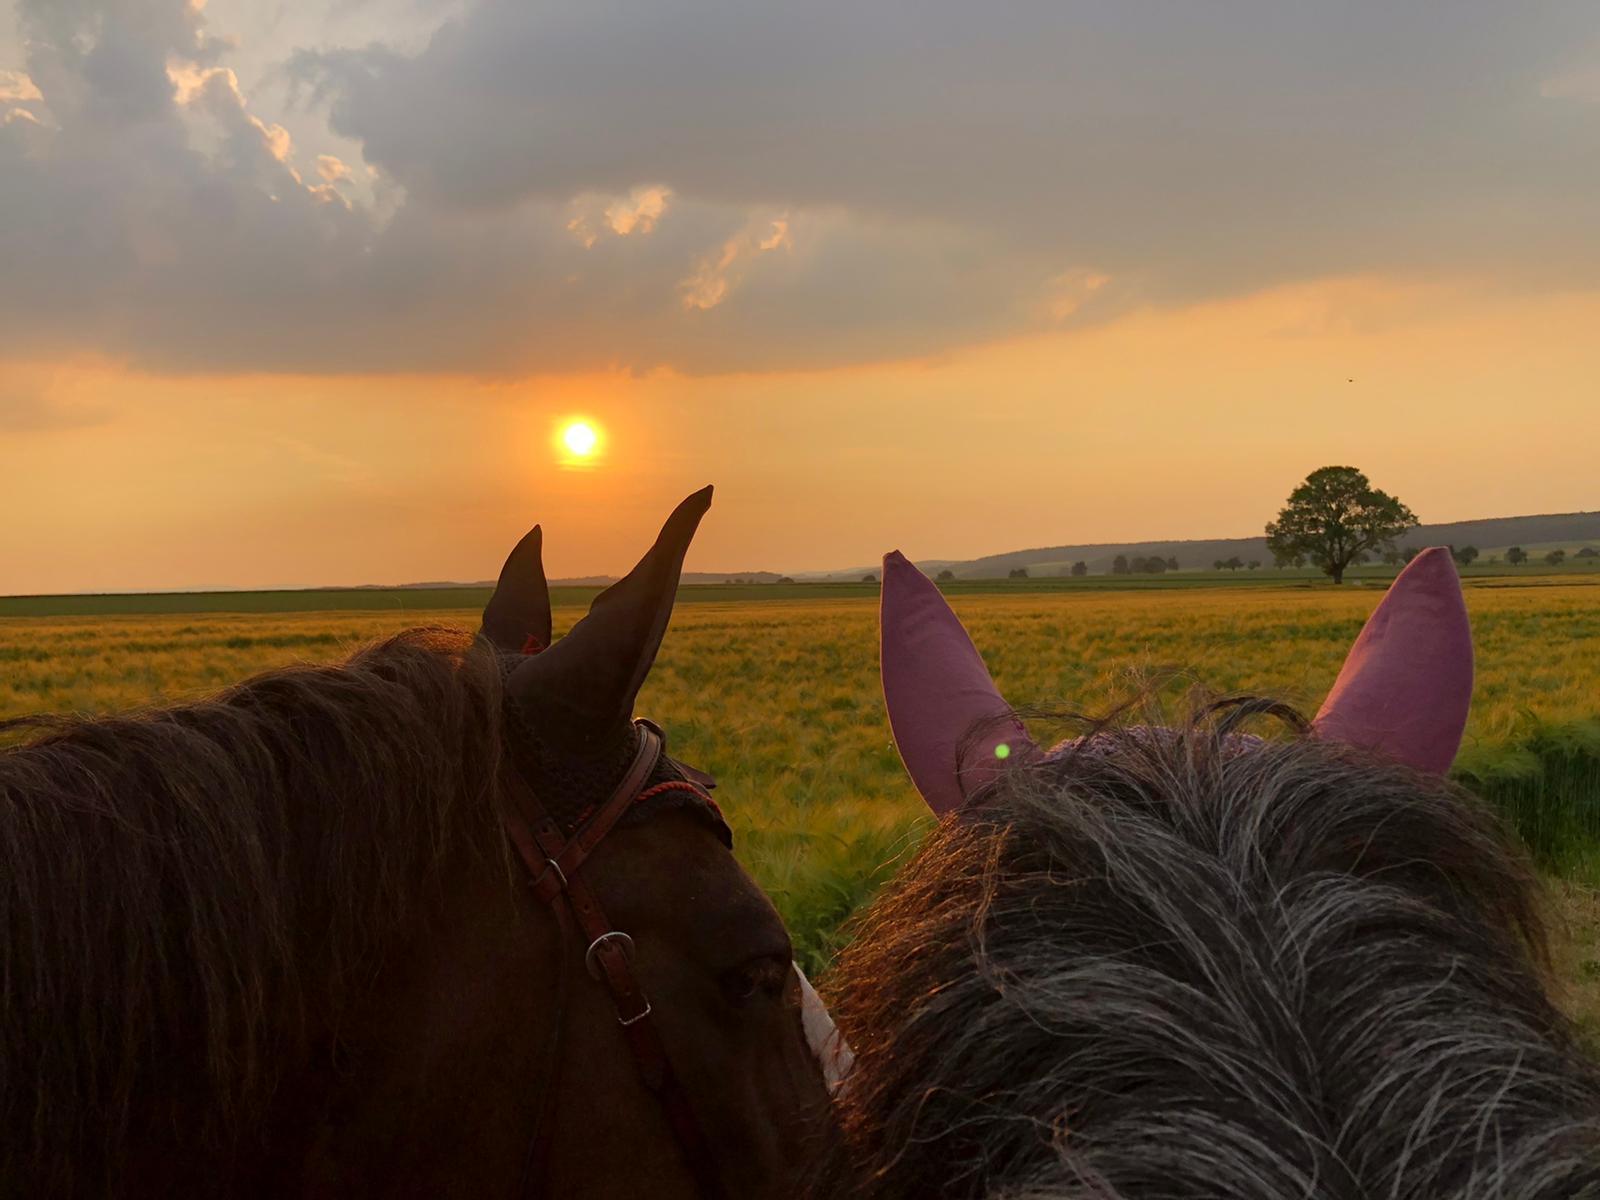 Sonnenuntergang wunderschön